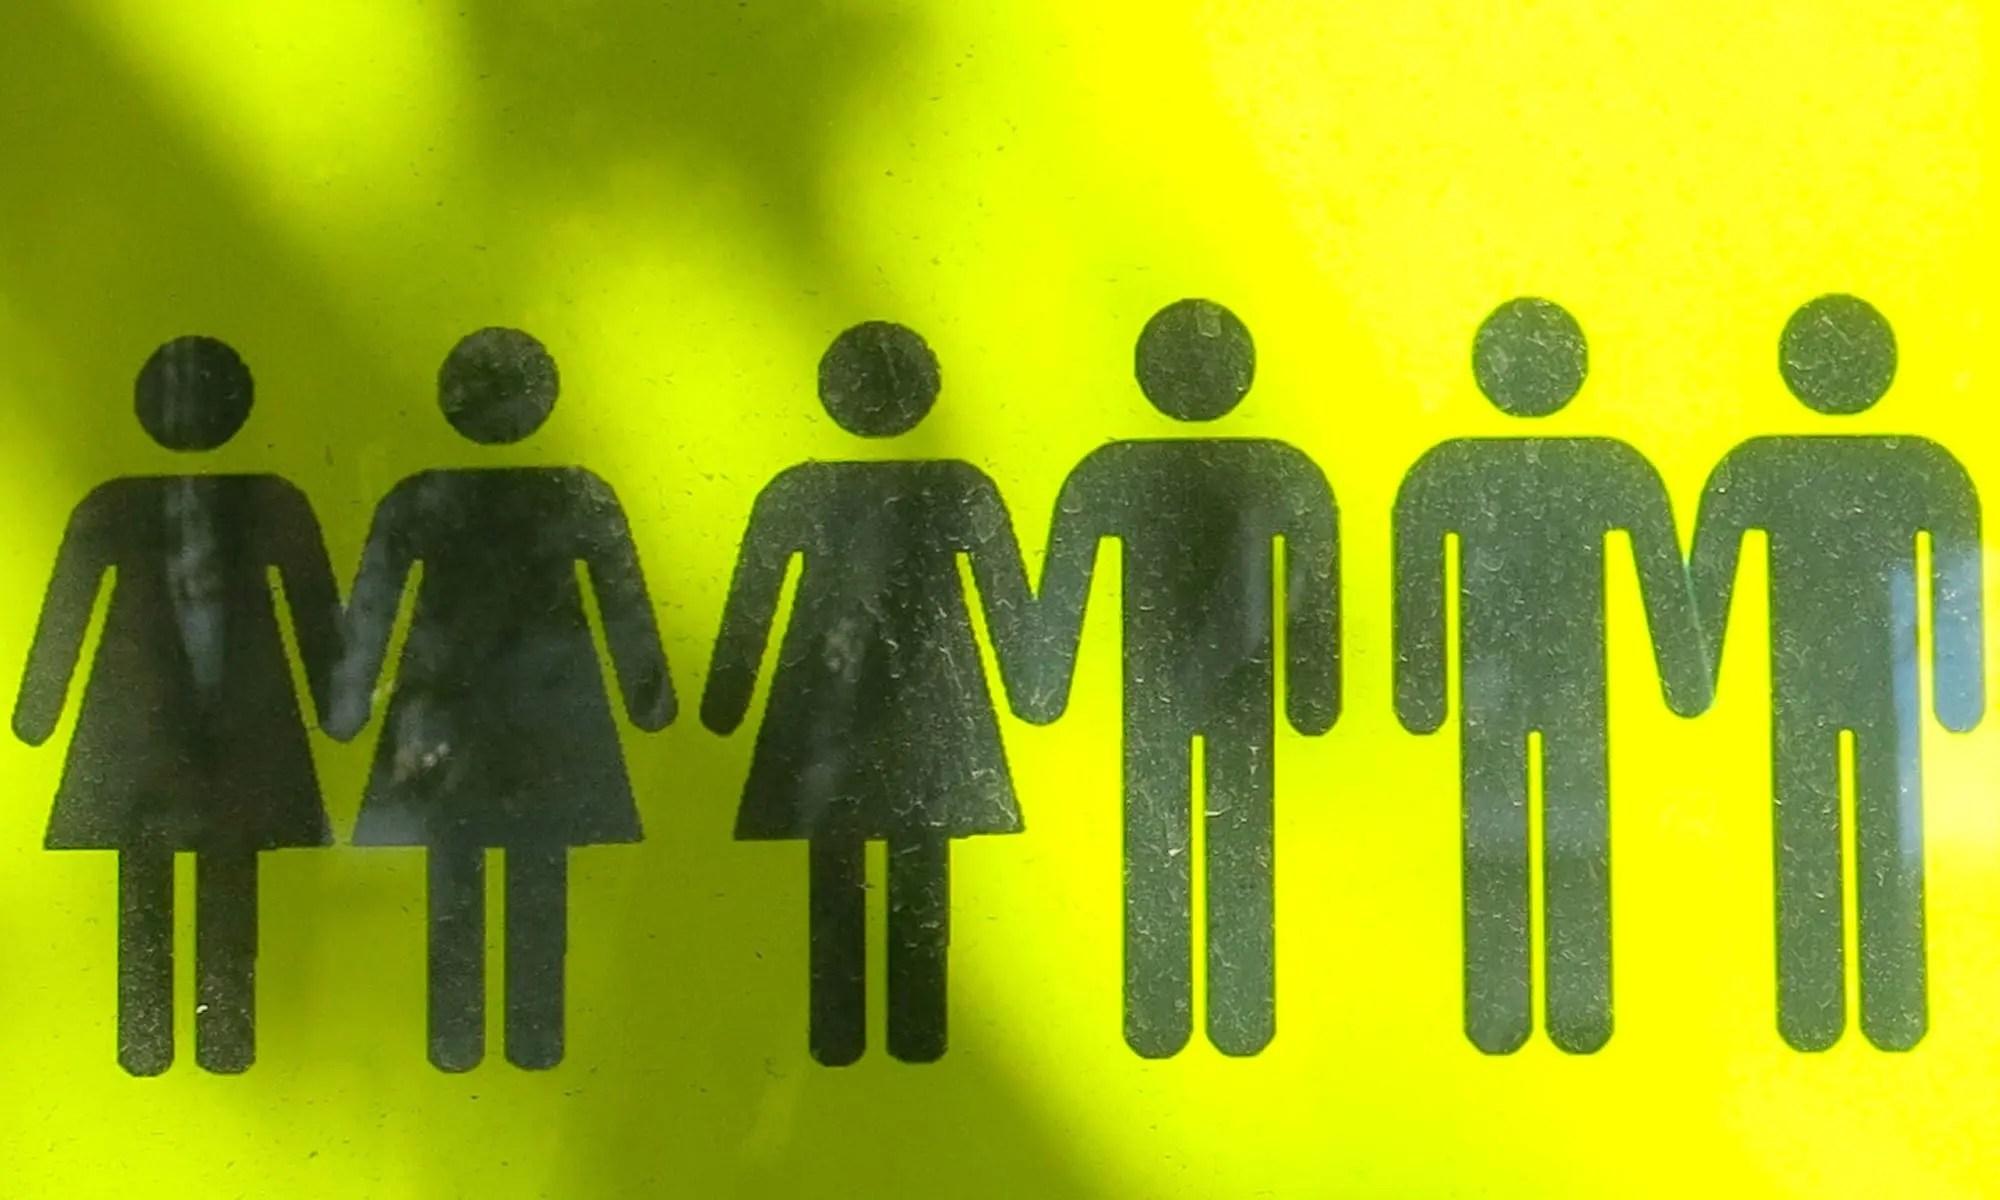 Sexual orientation image